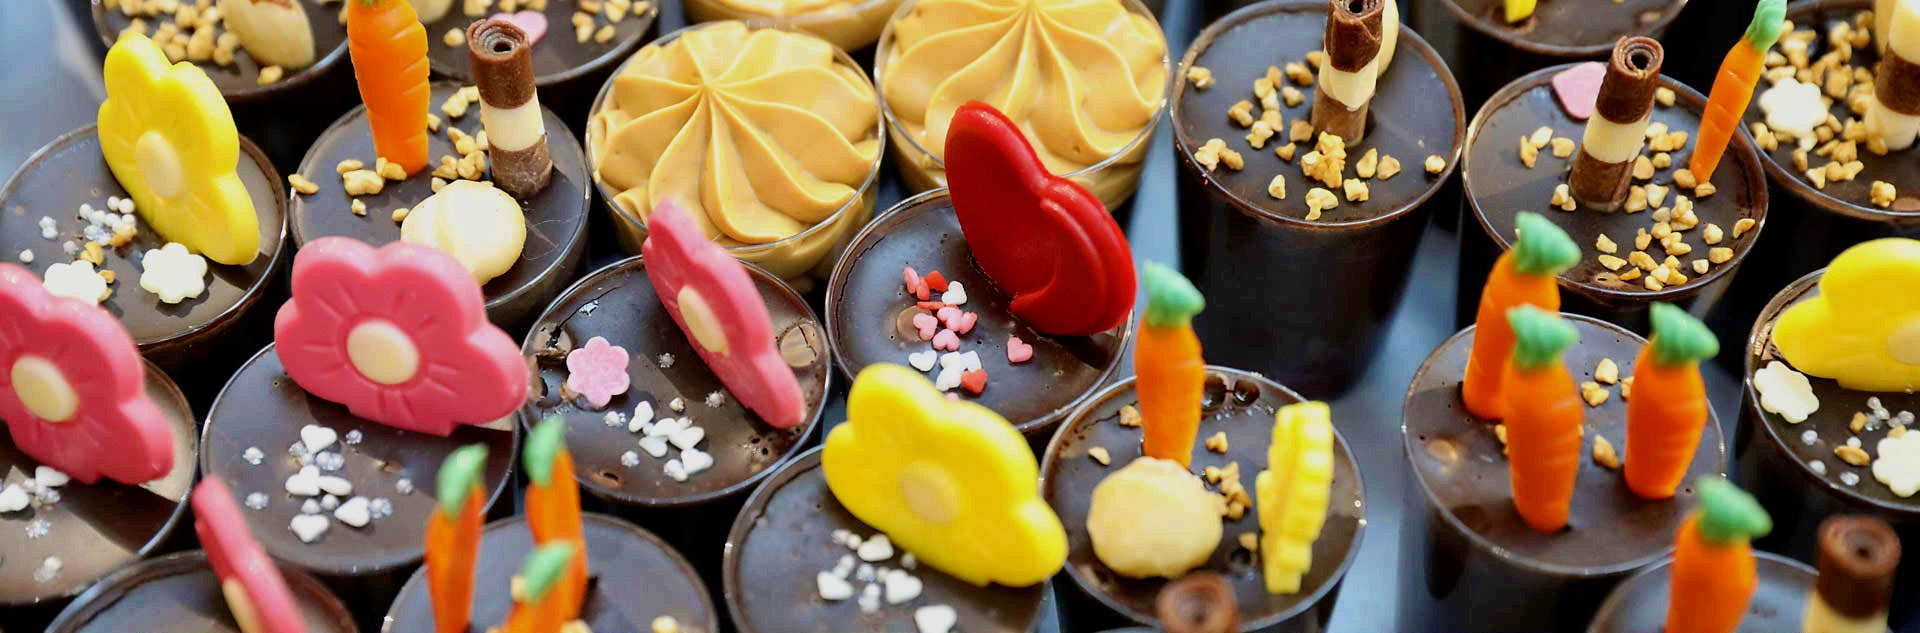 Oktober: Schokoladenfestival in Valtice